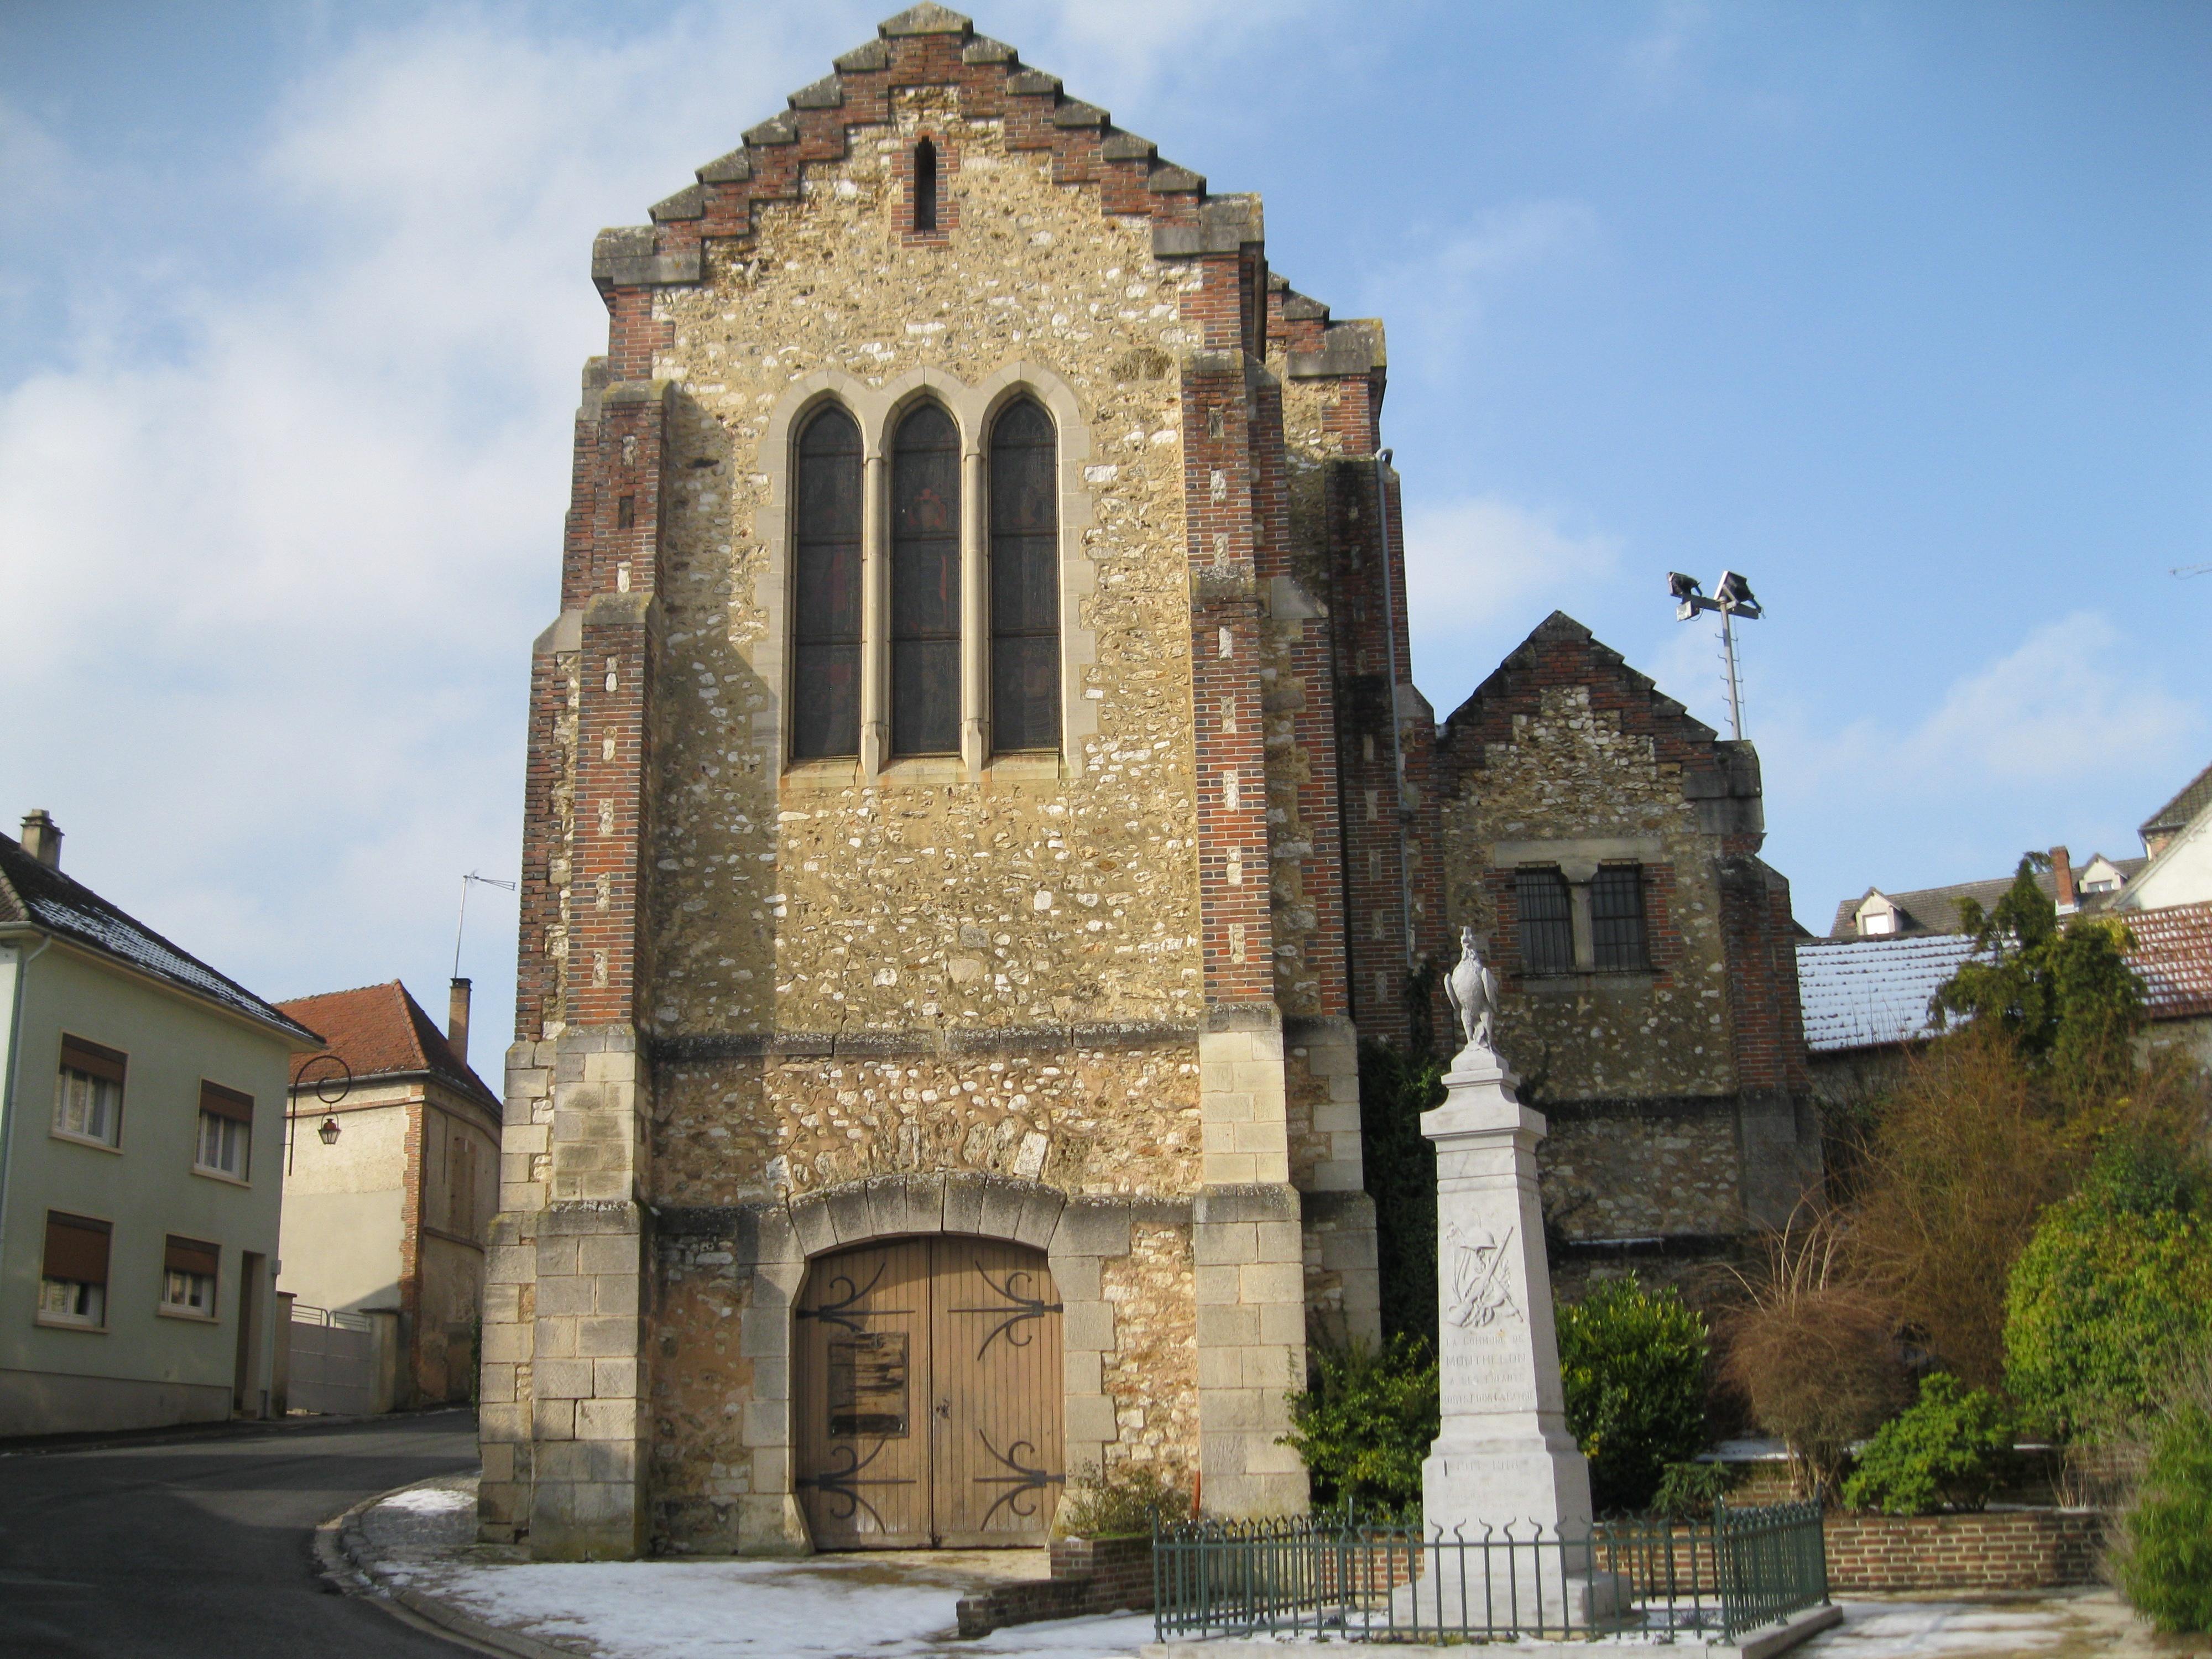 Monthelon, Marne